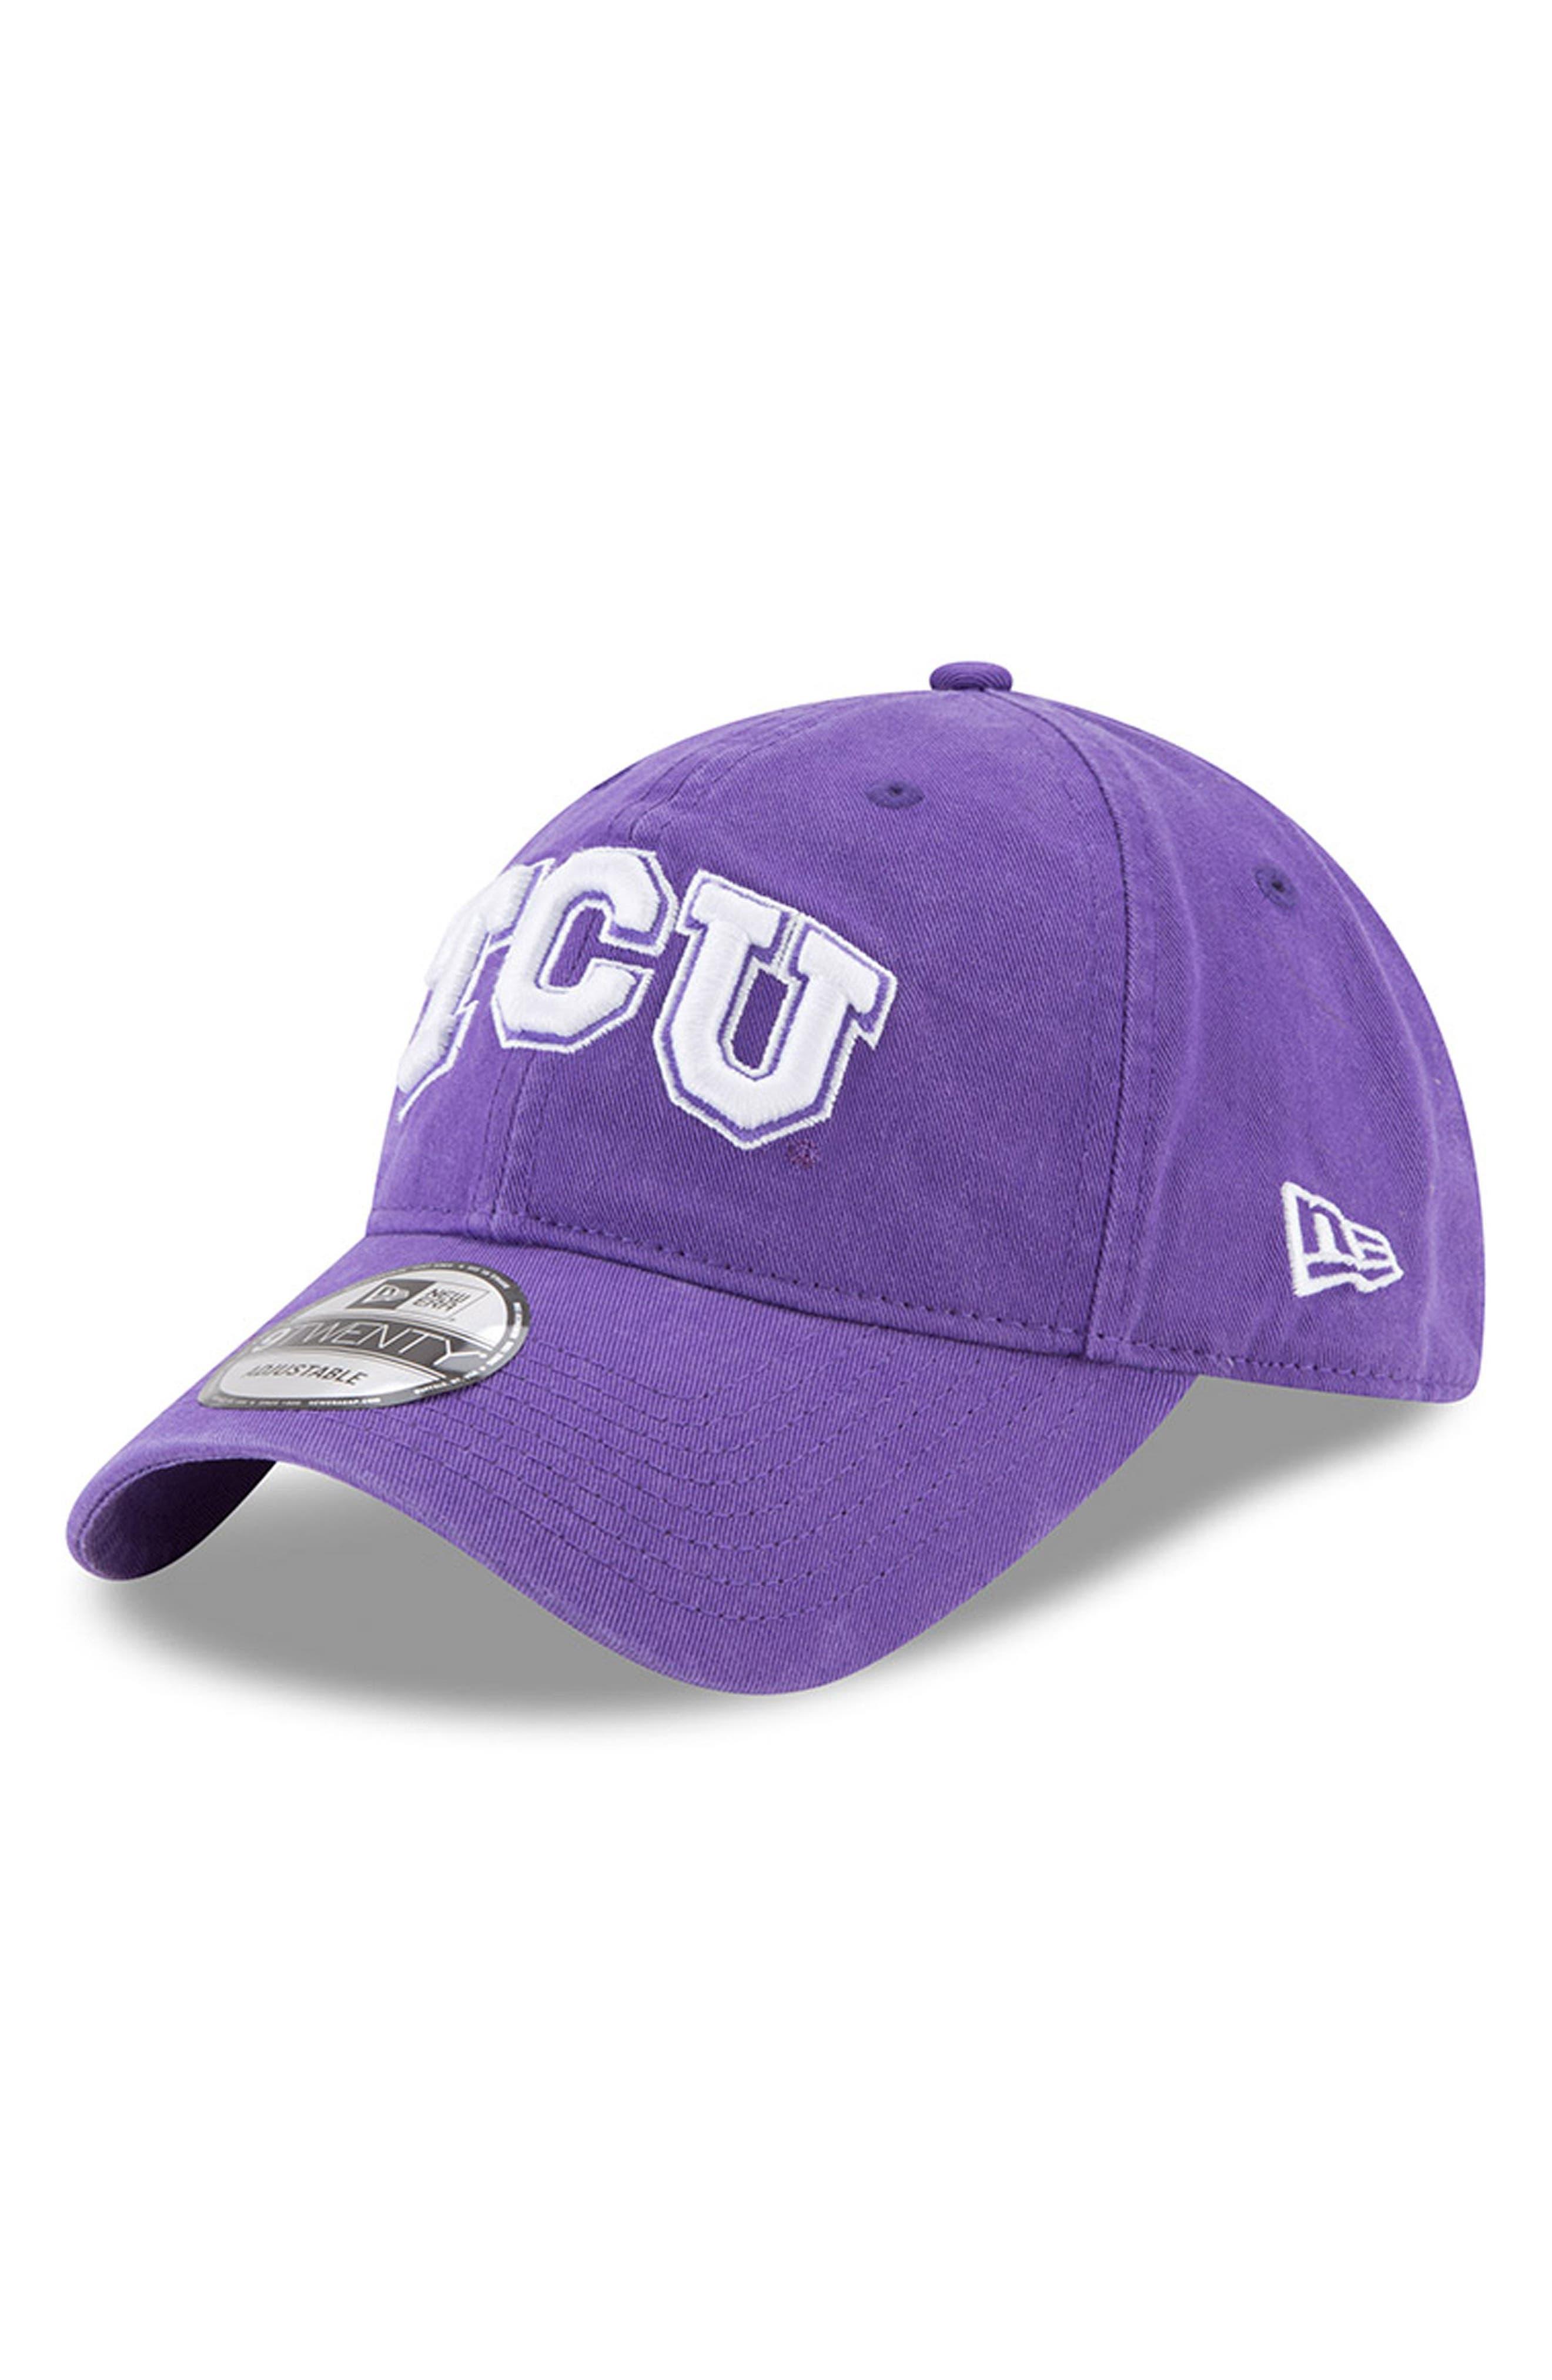 Collegiate Core Classic Baseball Cap,                         Main,                         color, Tcu Horned Frogs